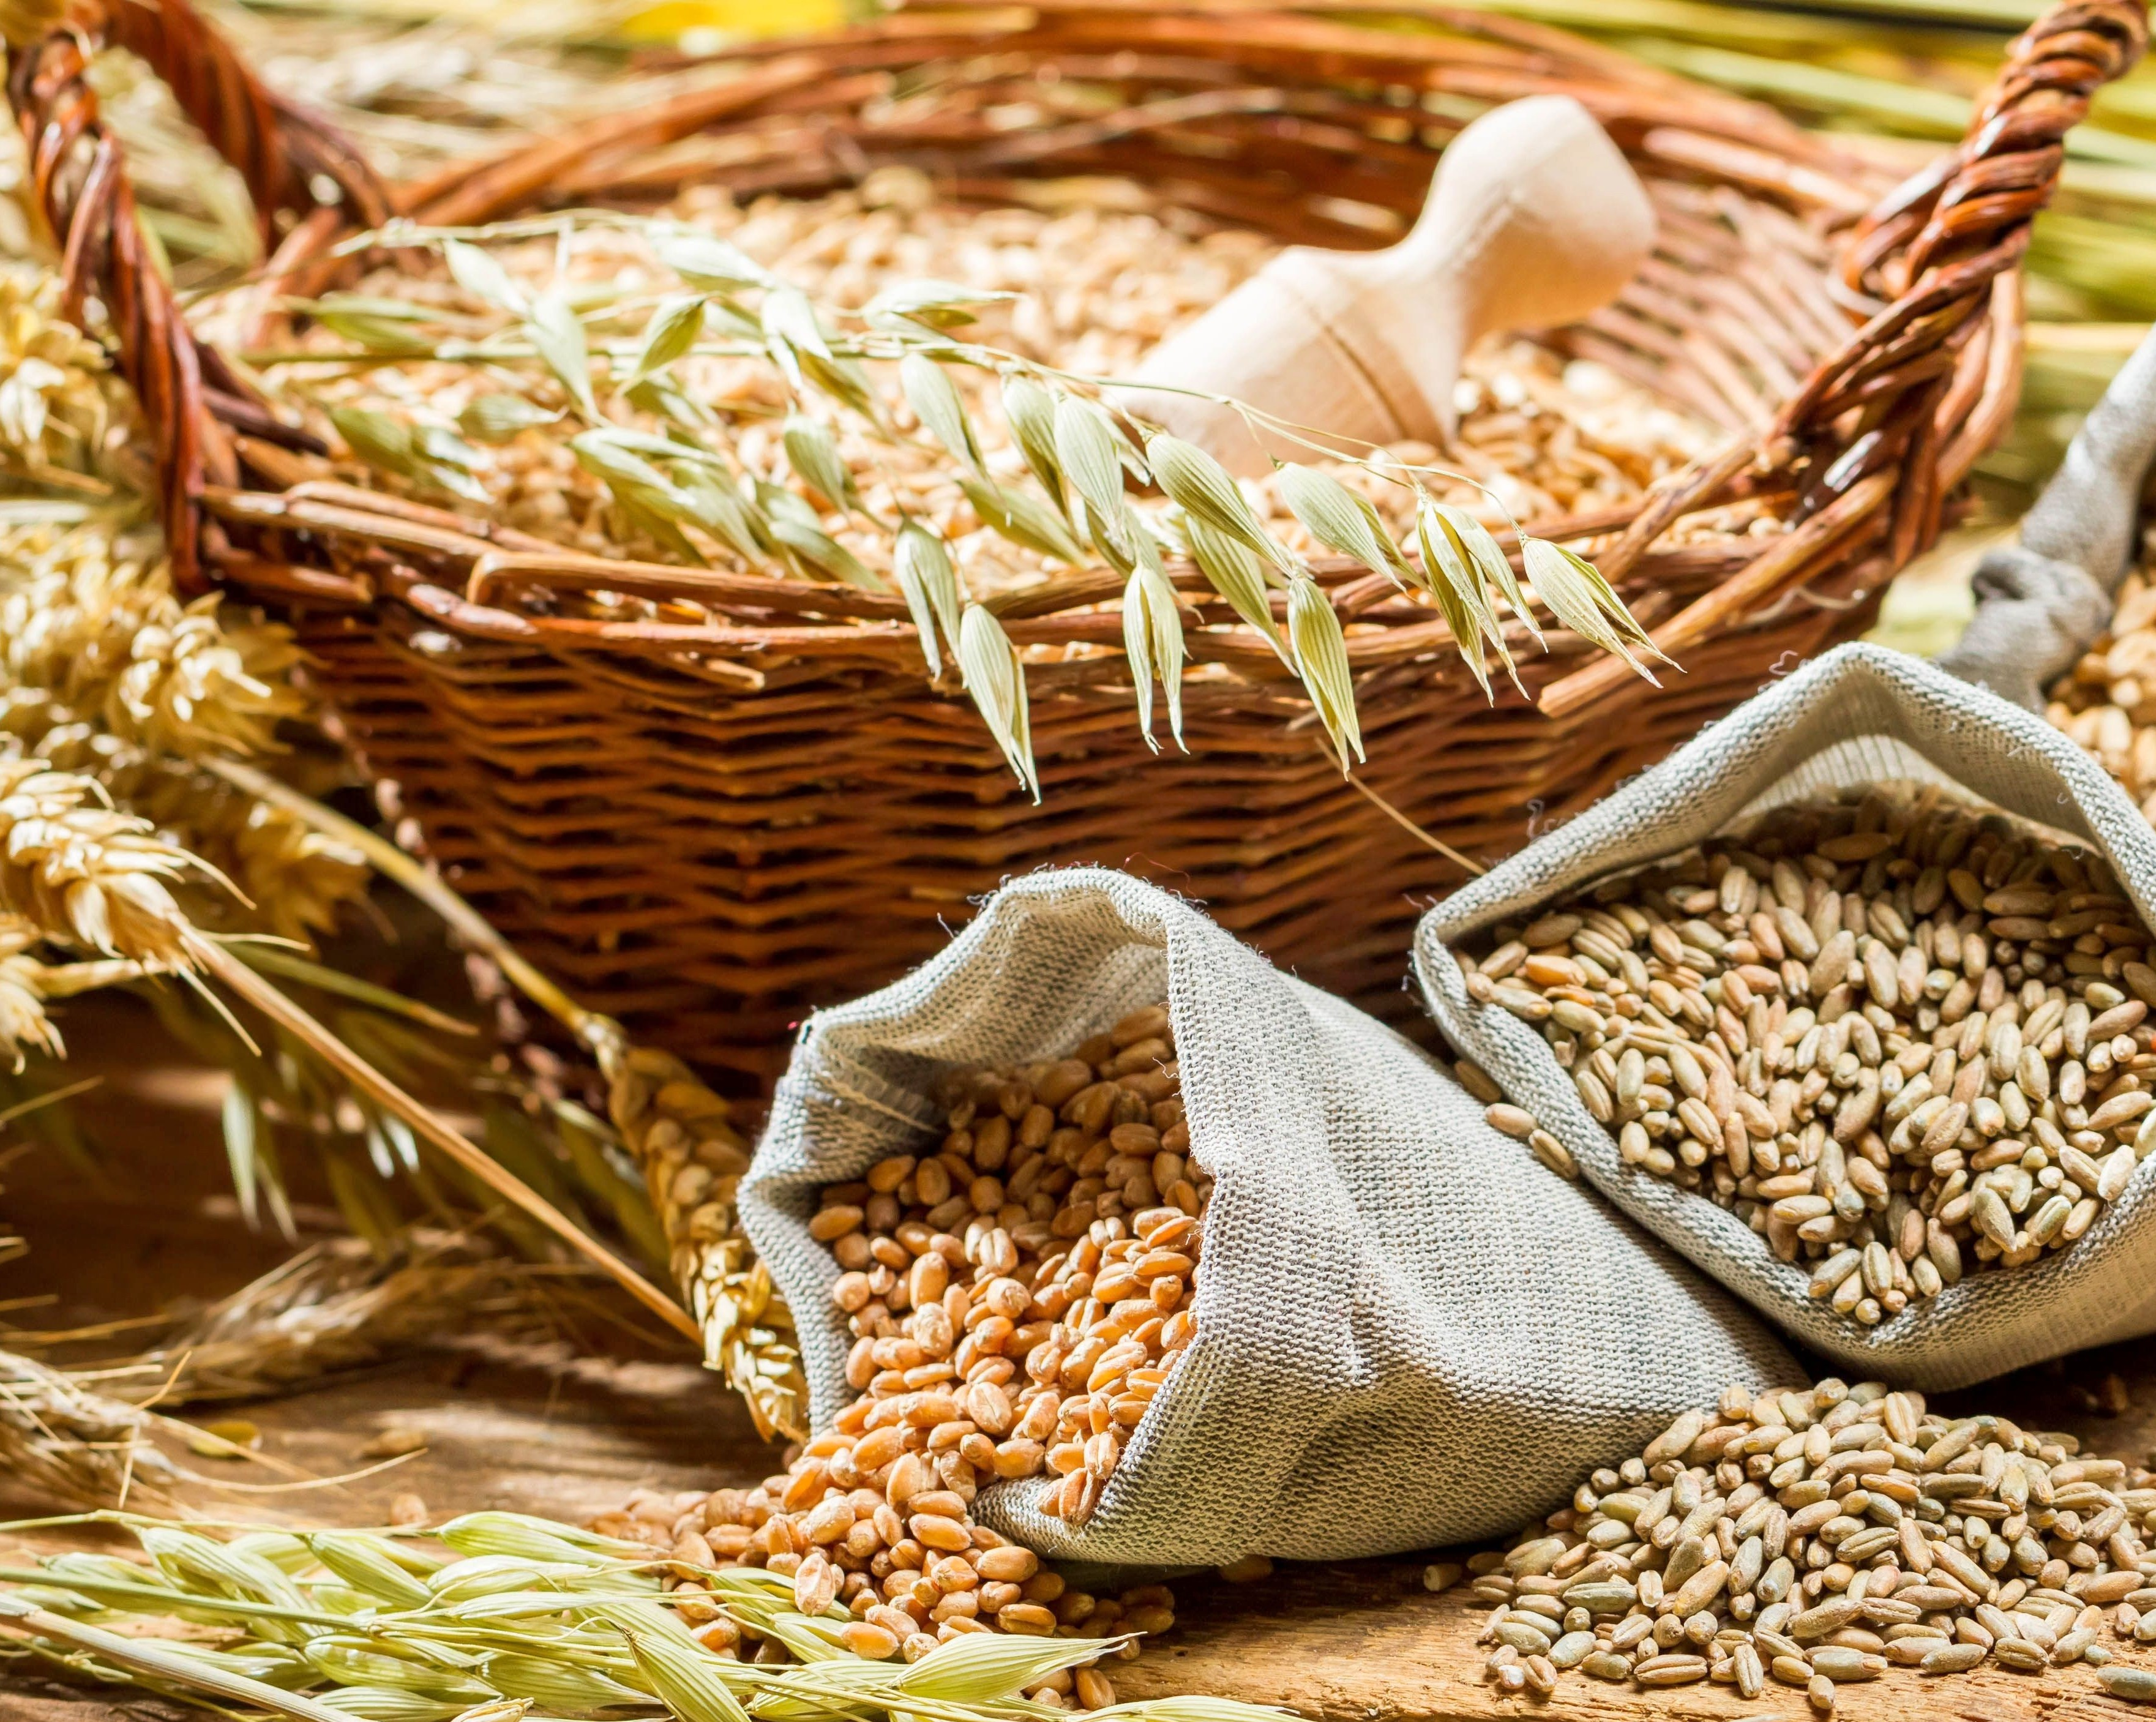 Украинские аграрии уже собрали практически 20 млн тзерна